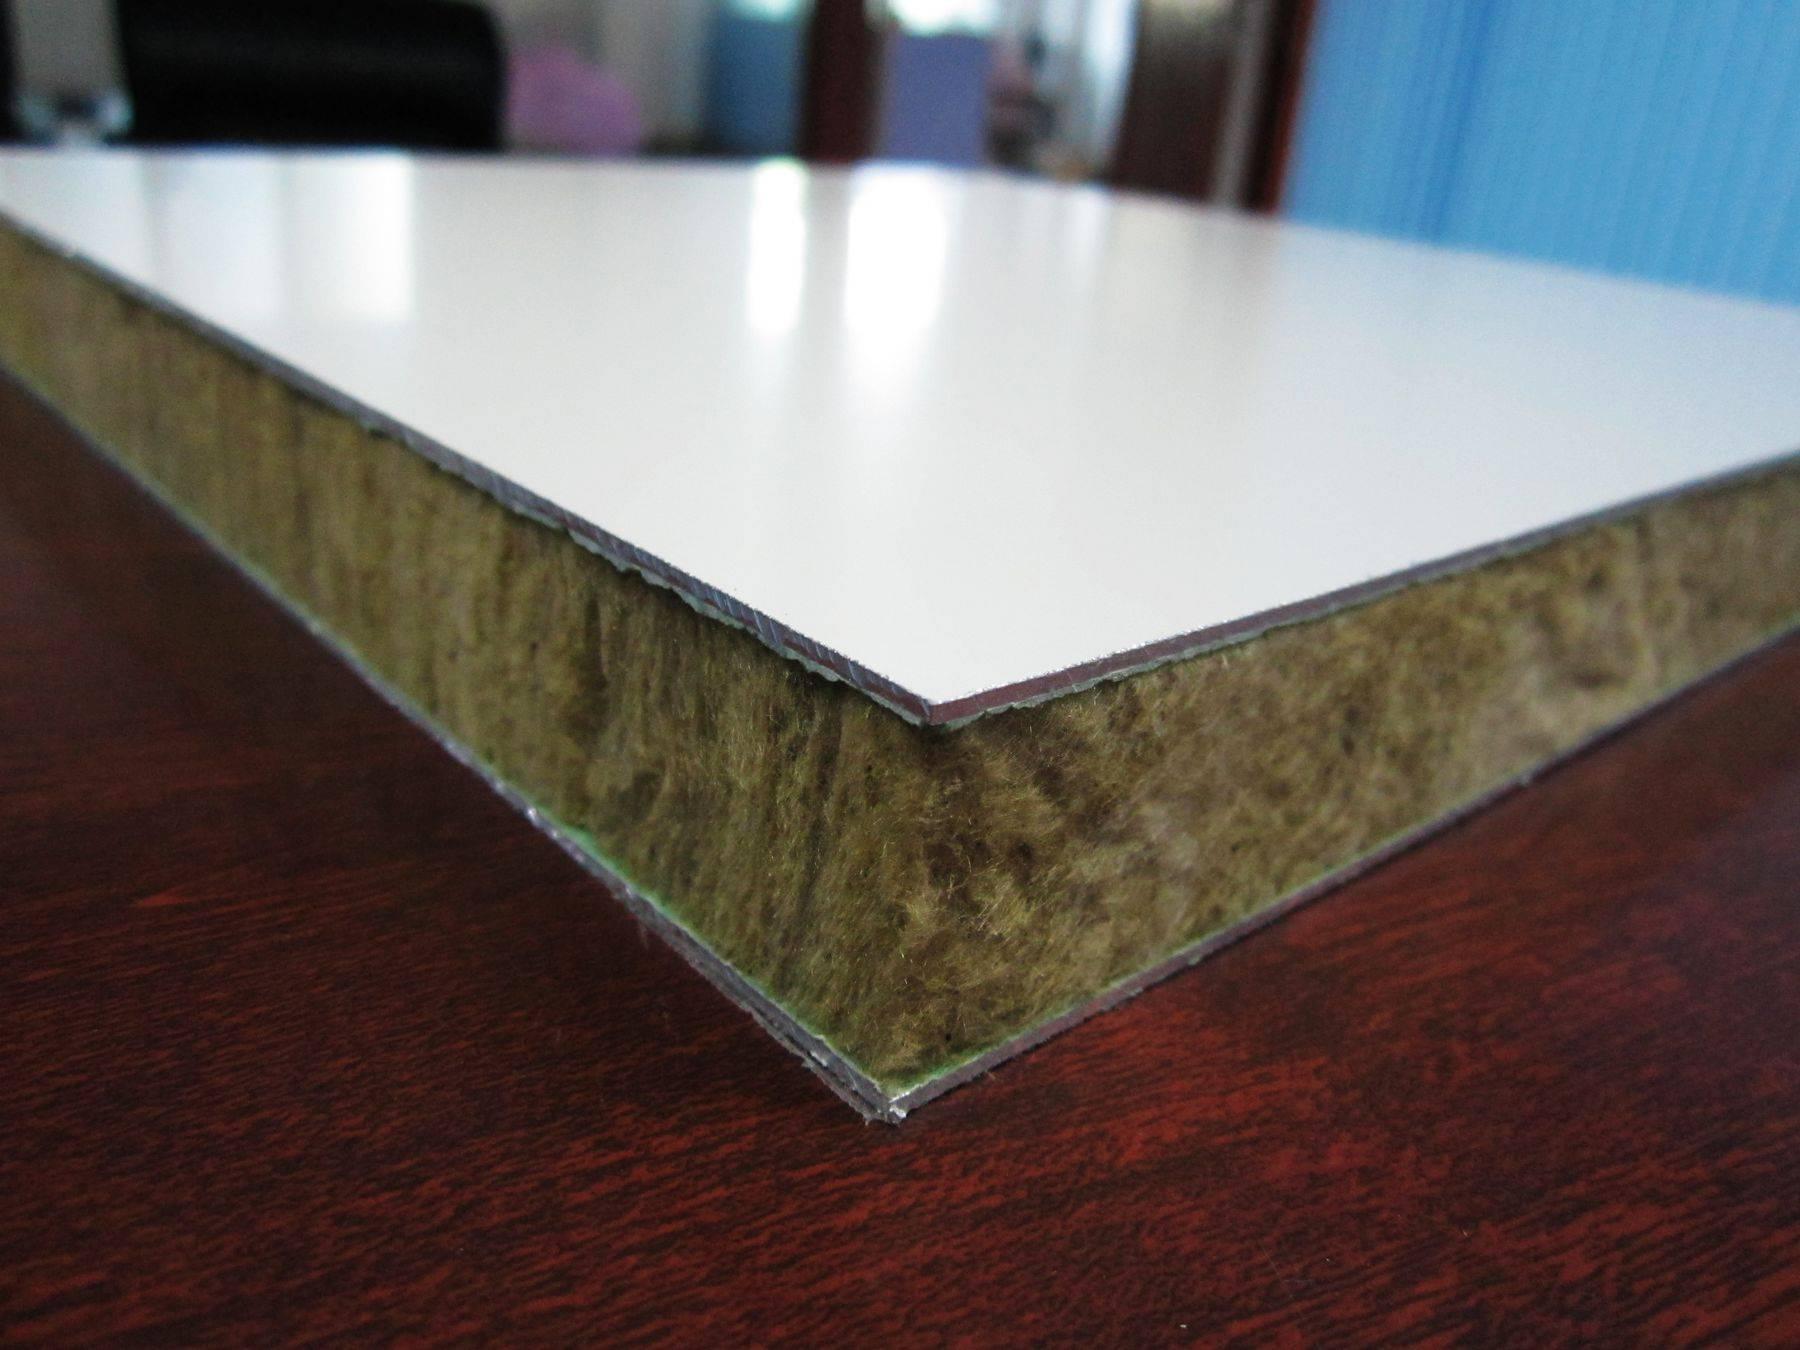 Rockwool insulation panel